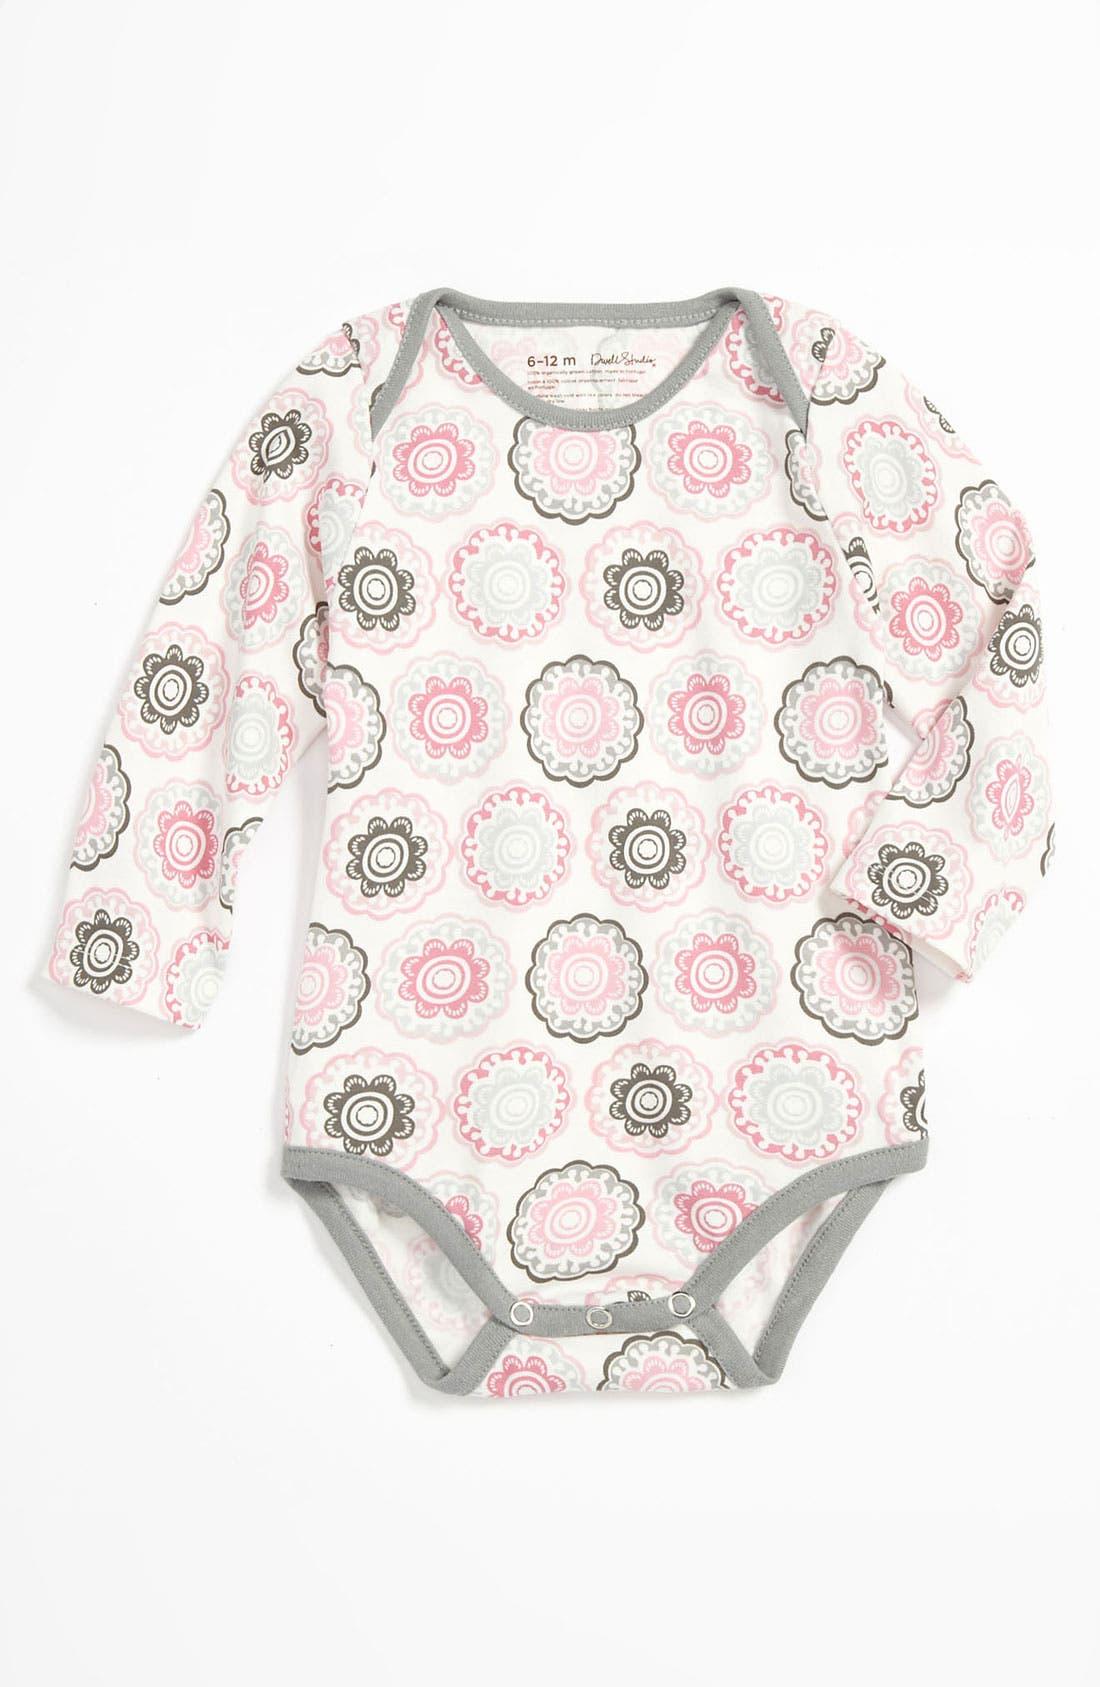 Alternate Image 1 Selected - DwellStudio Long Sleeve Bodysuit (Infant)